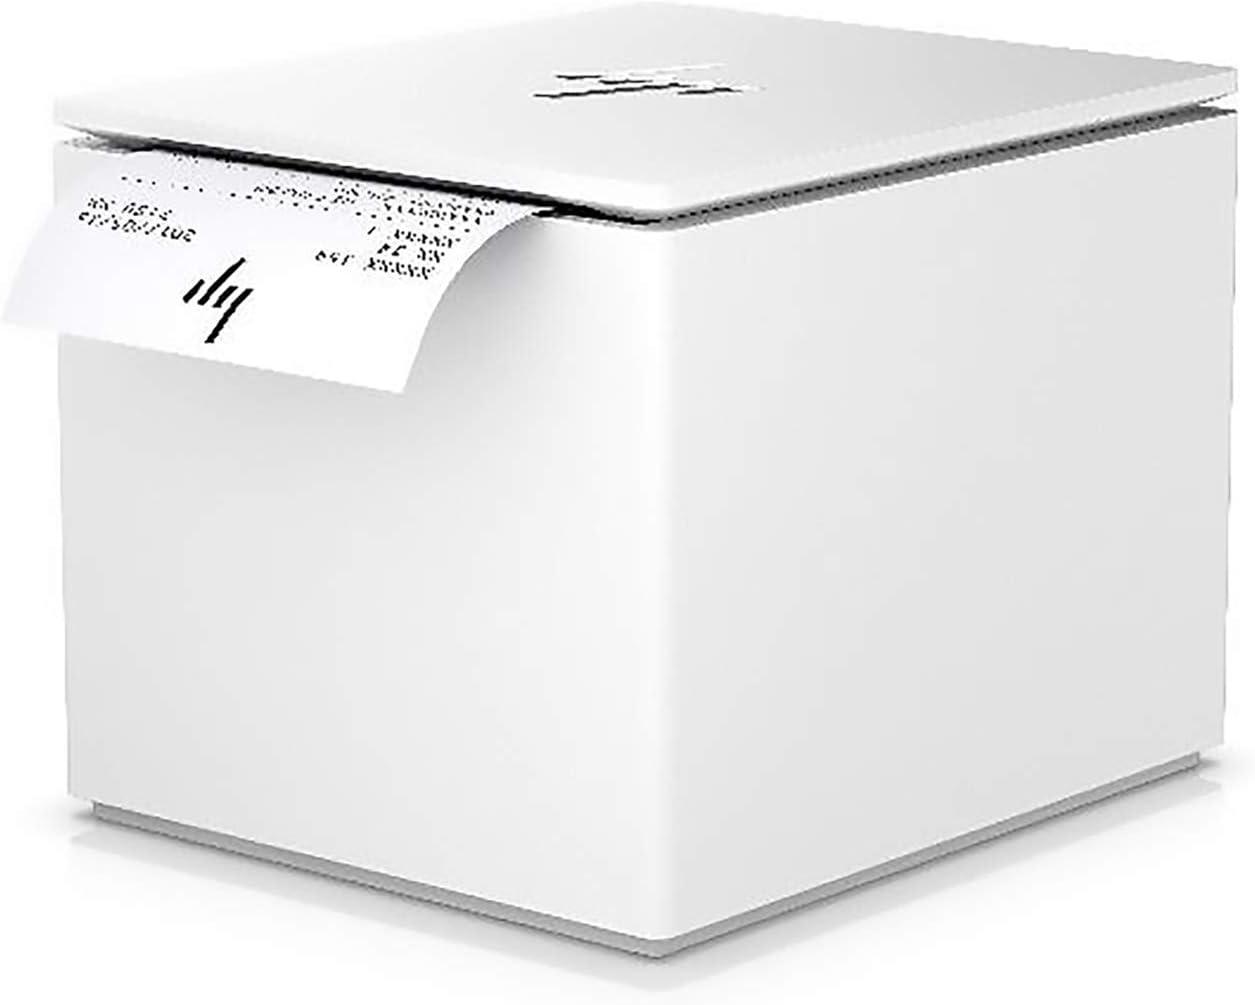 Genuine HP H300-E8SD-HPN0 L17402-002 923388-001 923388-002 923388-003 Elite POS ElitePOS Engage One Serial USB Thermal Printer White